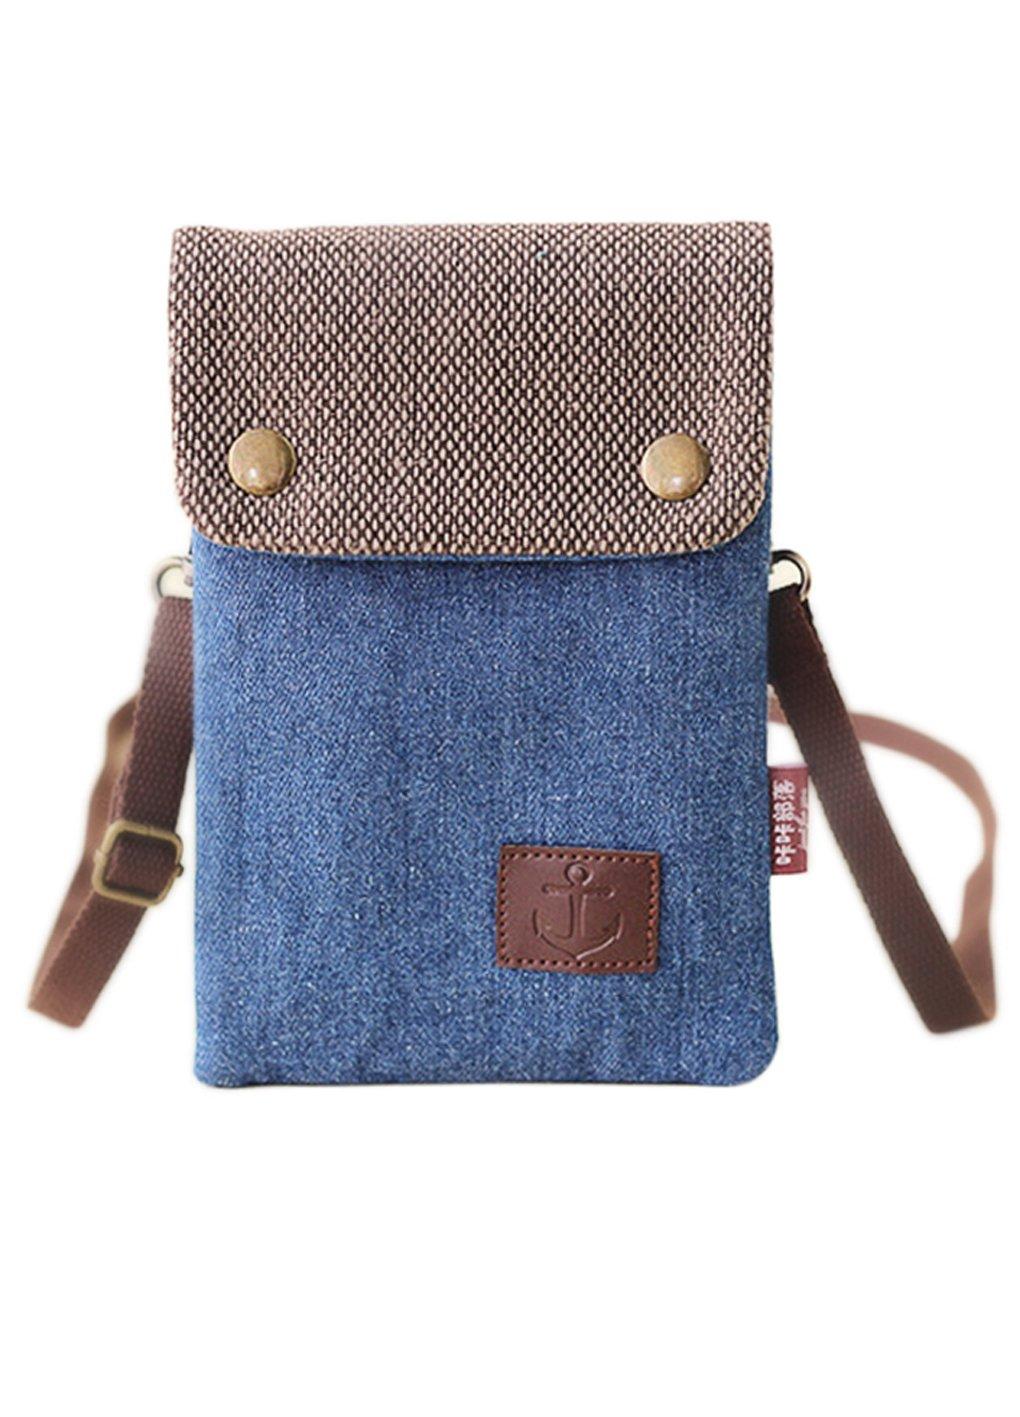 4d02ae5454 Cell Phone Holder Mini Crossbody Crossbody Purse Shoulder Bag Smartphone  Wristlet Wallet Women s Girl s Cotton Canvas Bag Purse for Keys